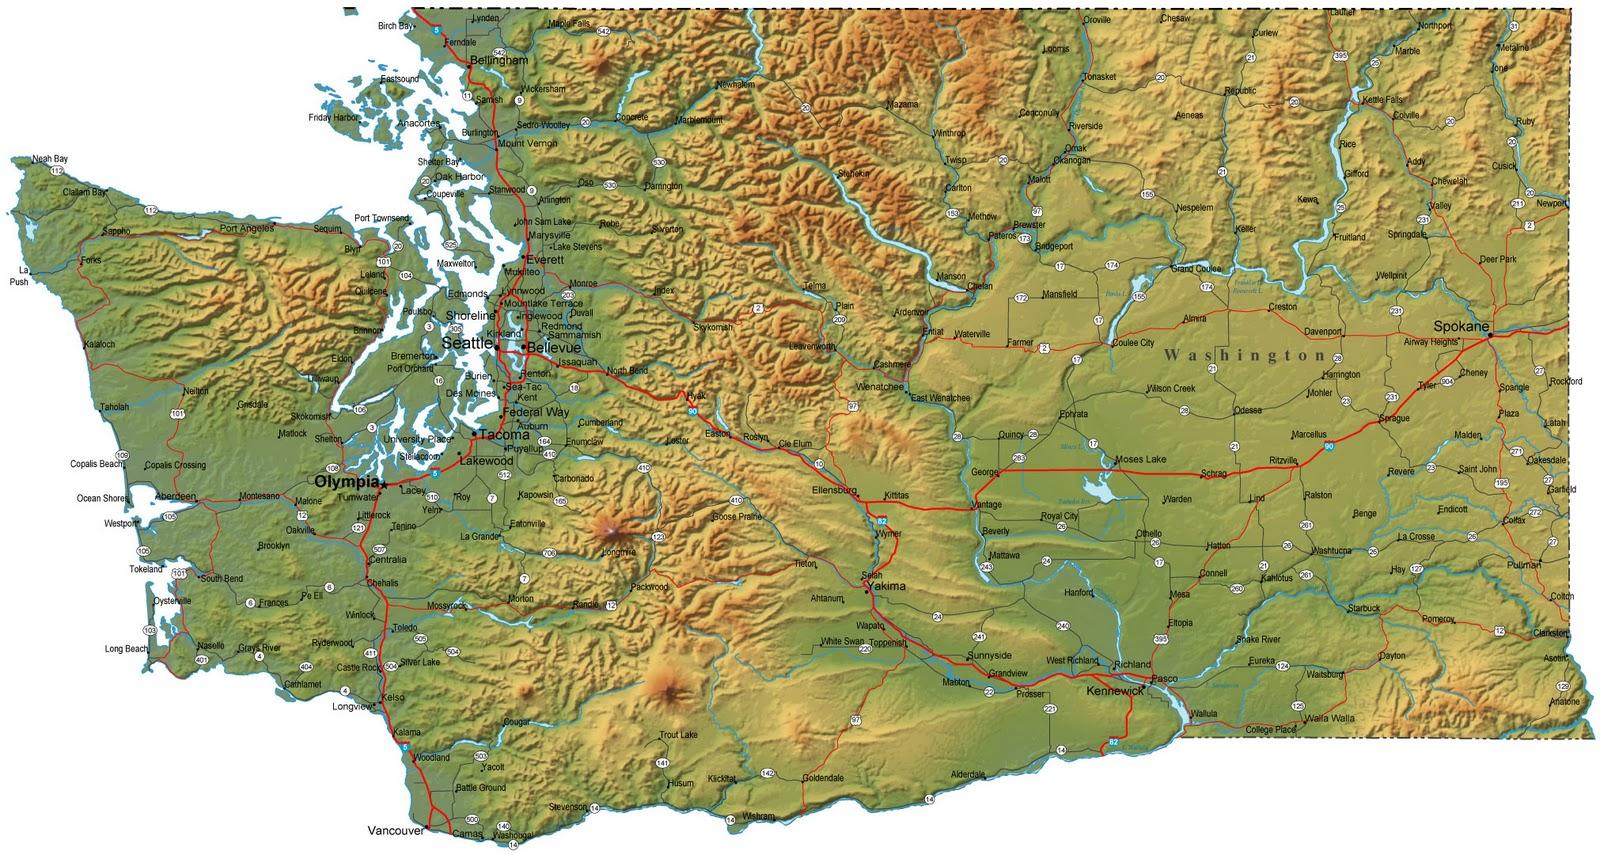 Em39s Class Journal Geography Of Washington